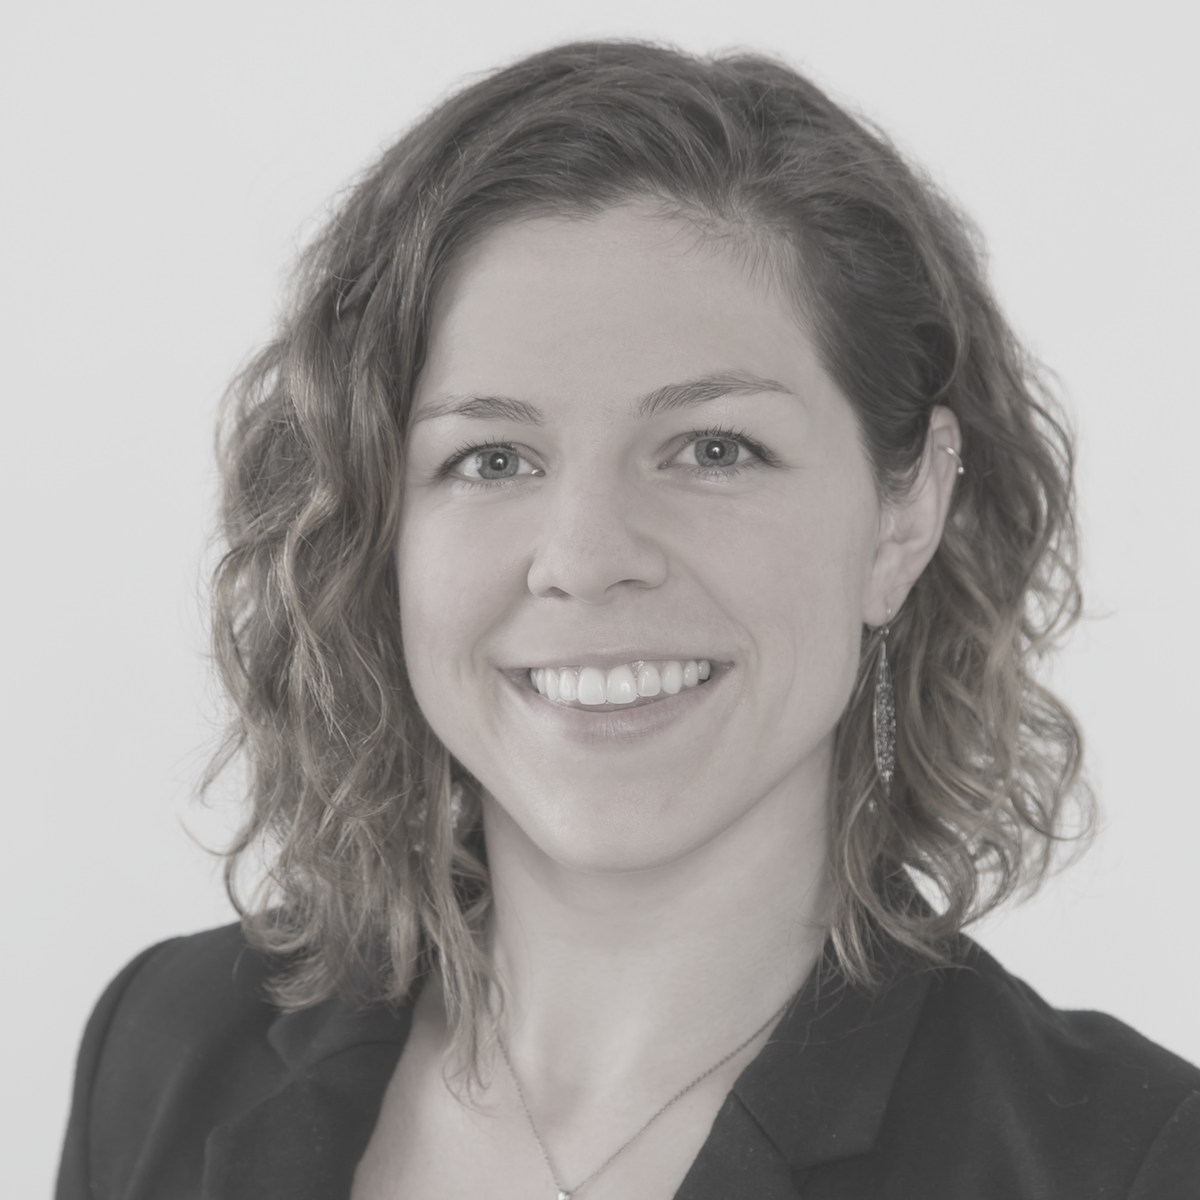 Stephanie Huls therapist interview